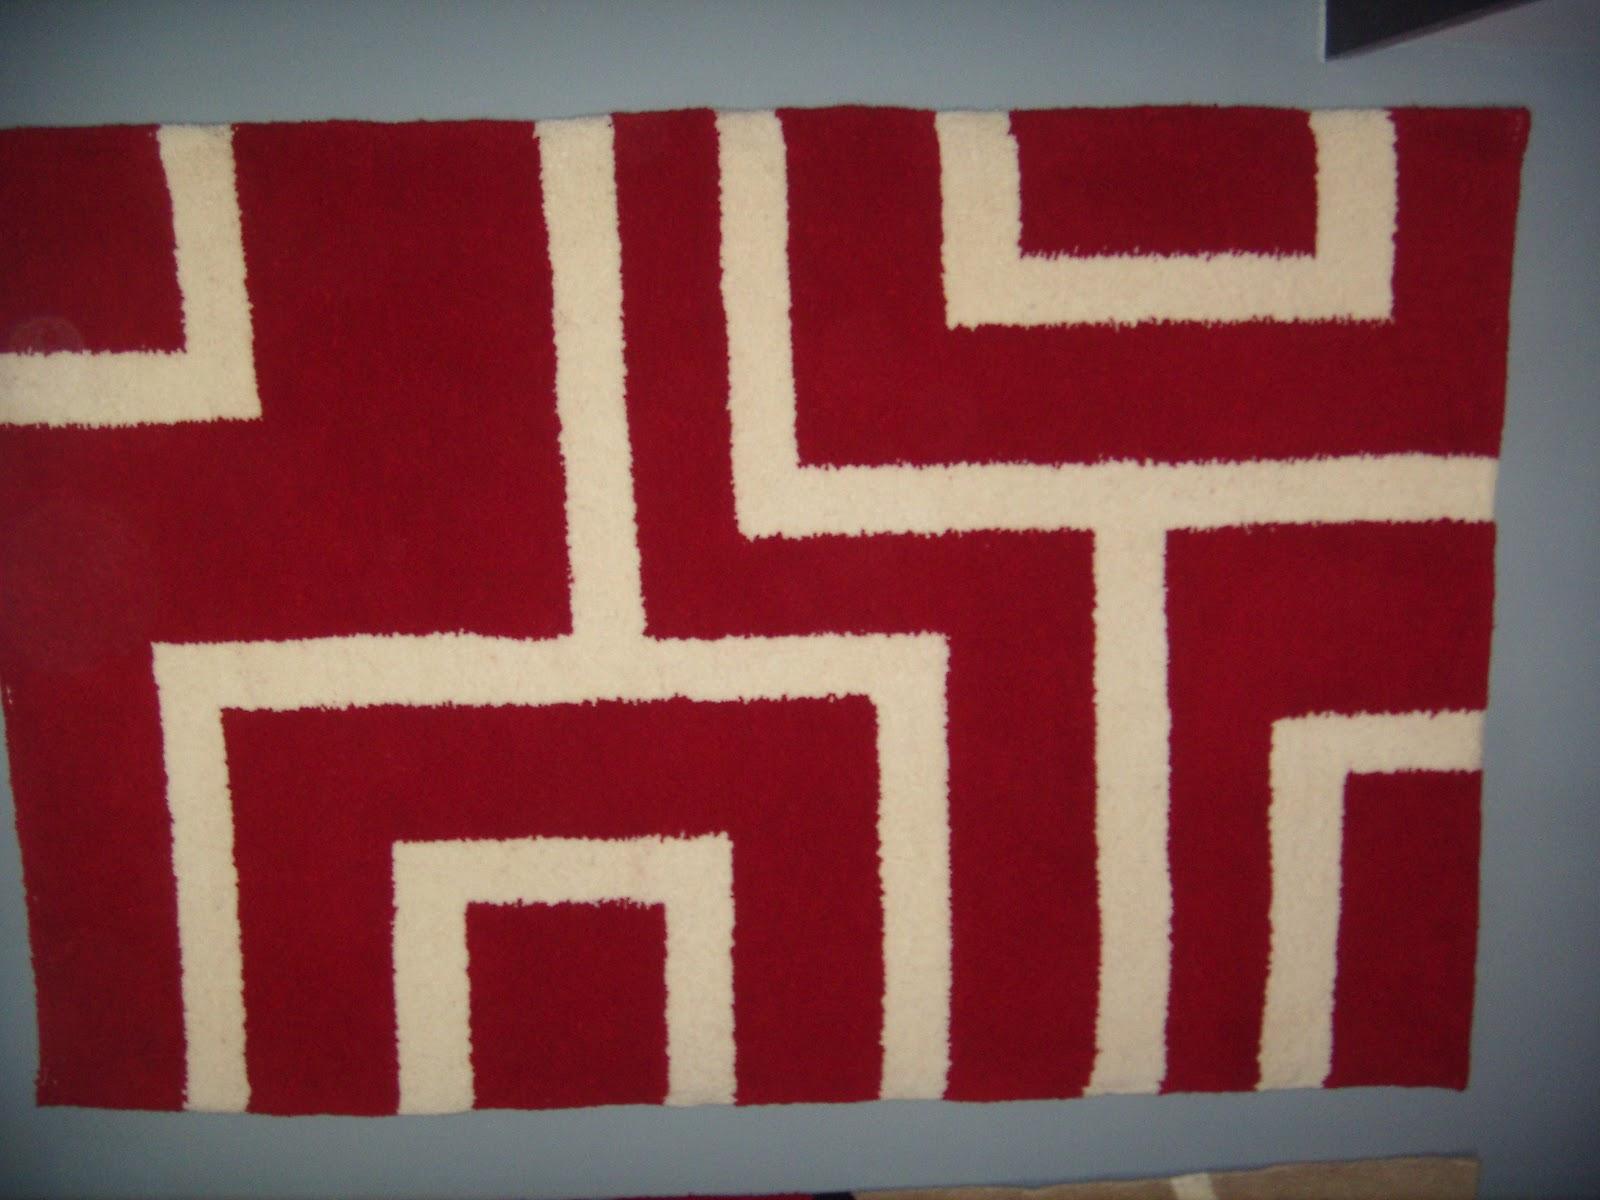 merycarpet tapis marocaine fait main neuf. Black Bedroom Furniture Sets. Home Design Ideas